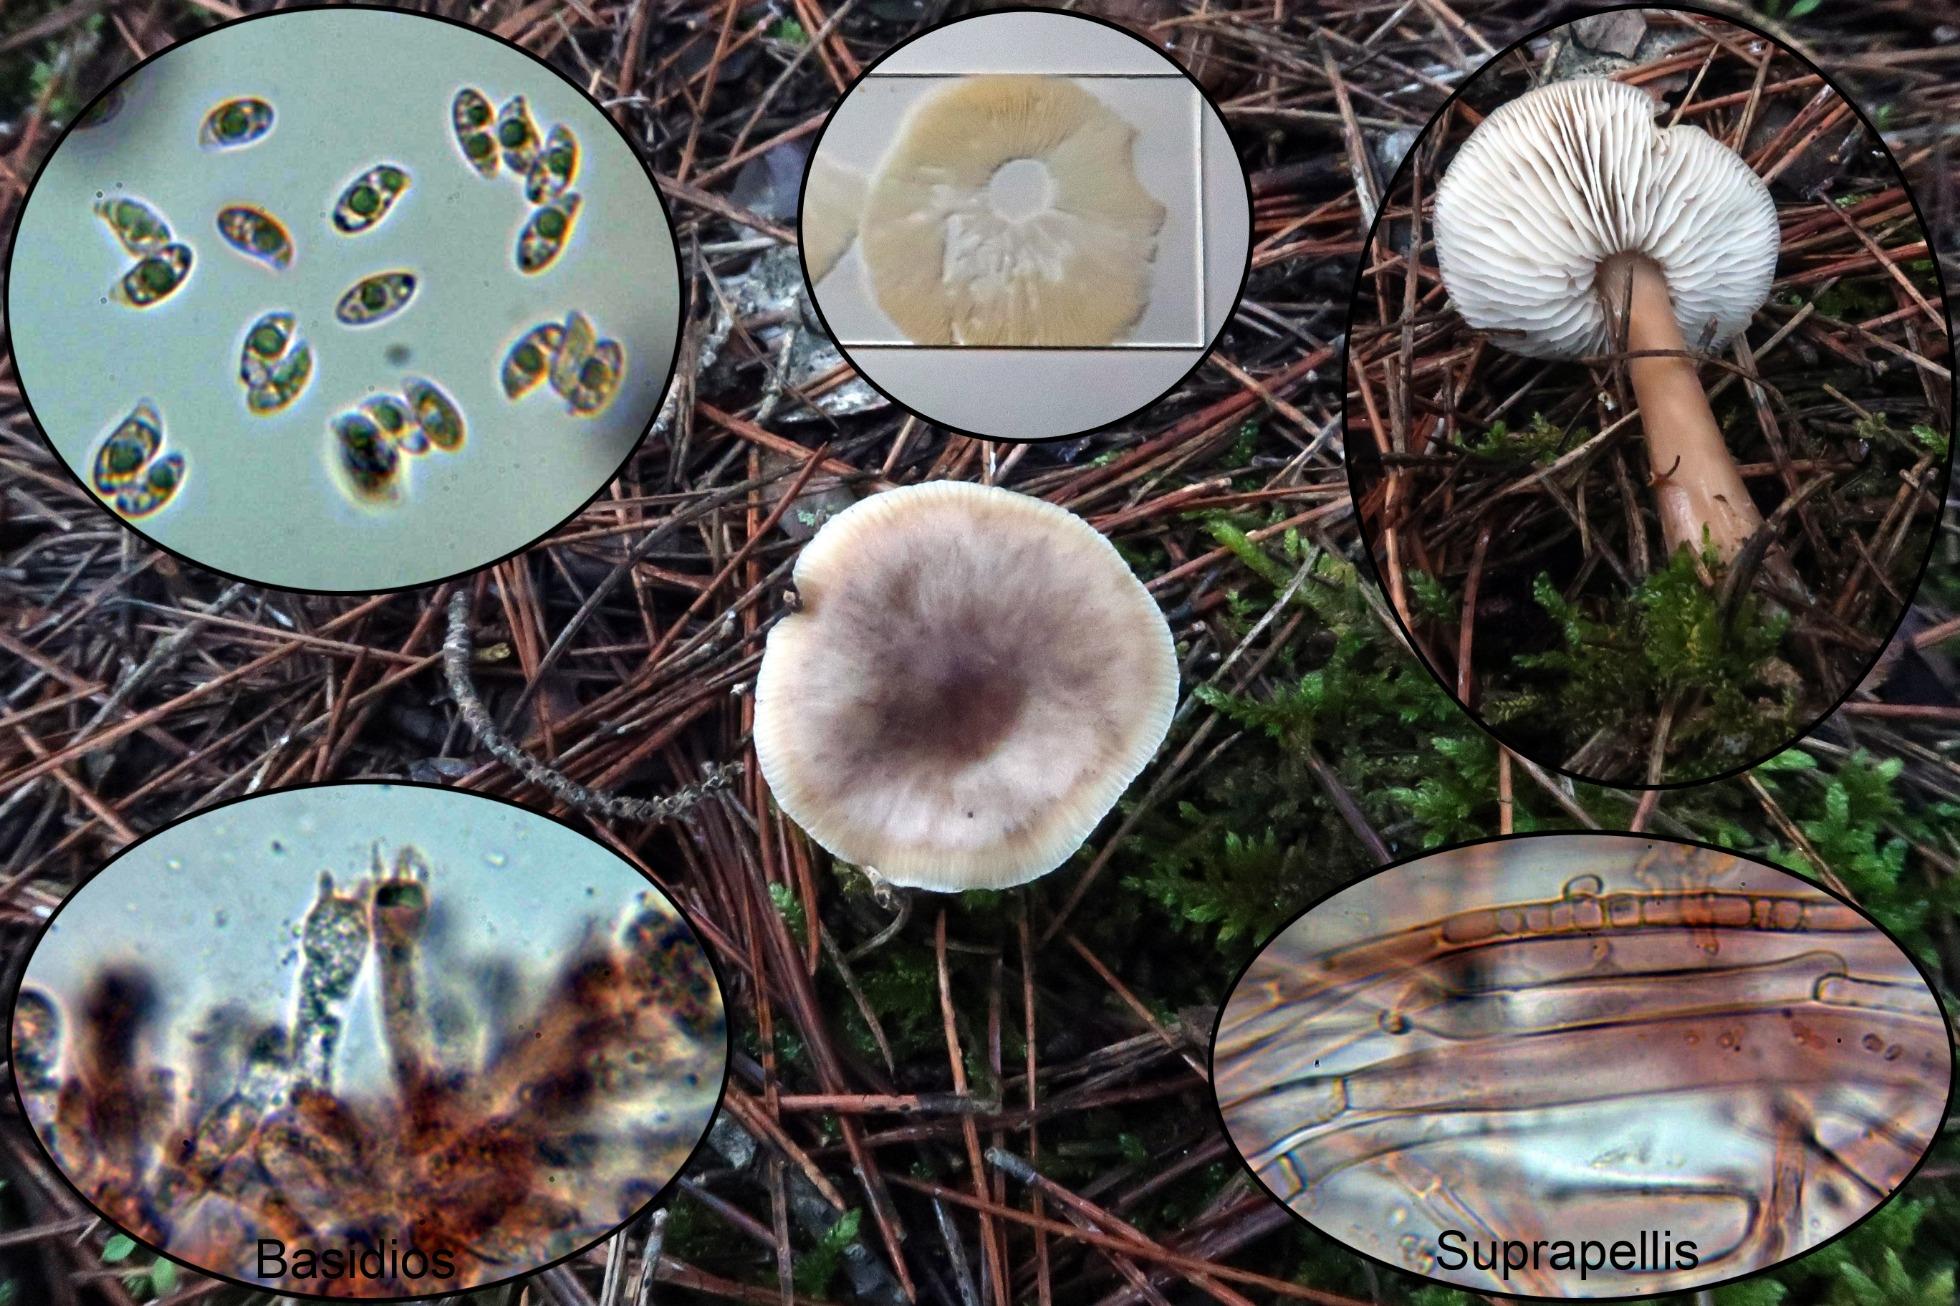 Rhodocollybiabutyraceap_2020-11-16.jpg